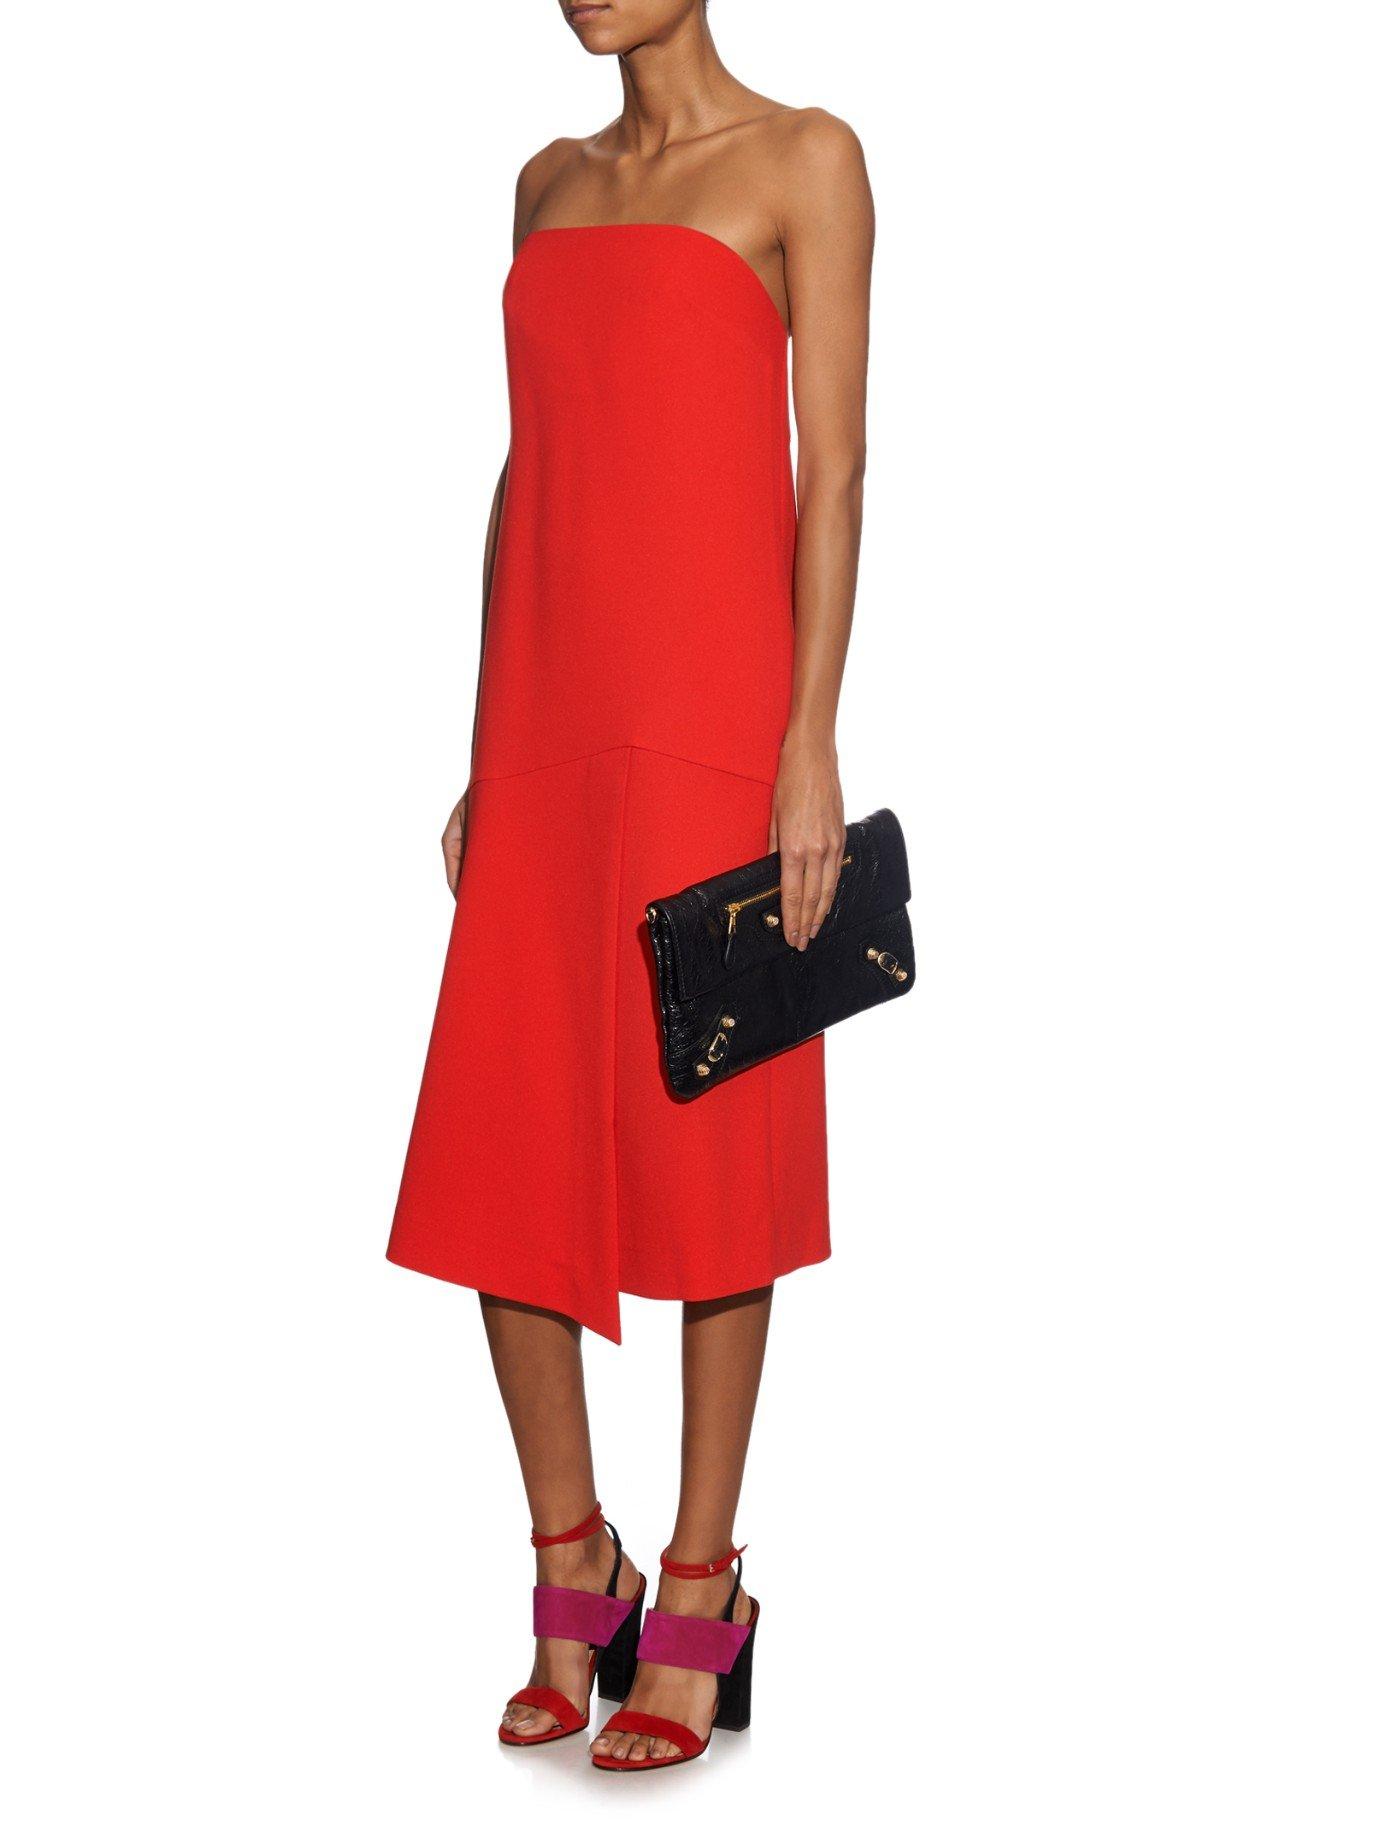 Tibi Strapless Drape Dress in Red - Lyst